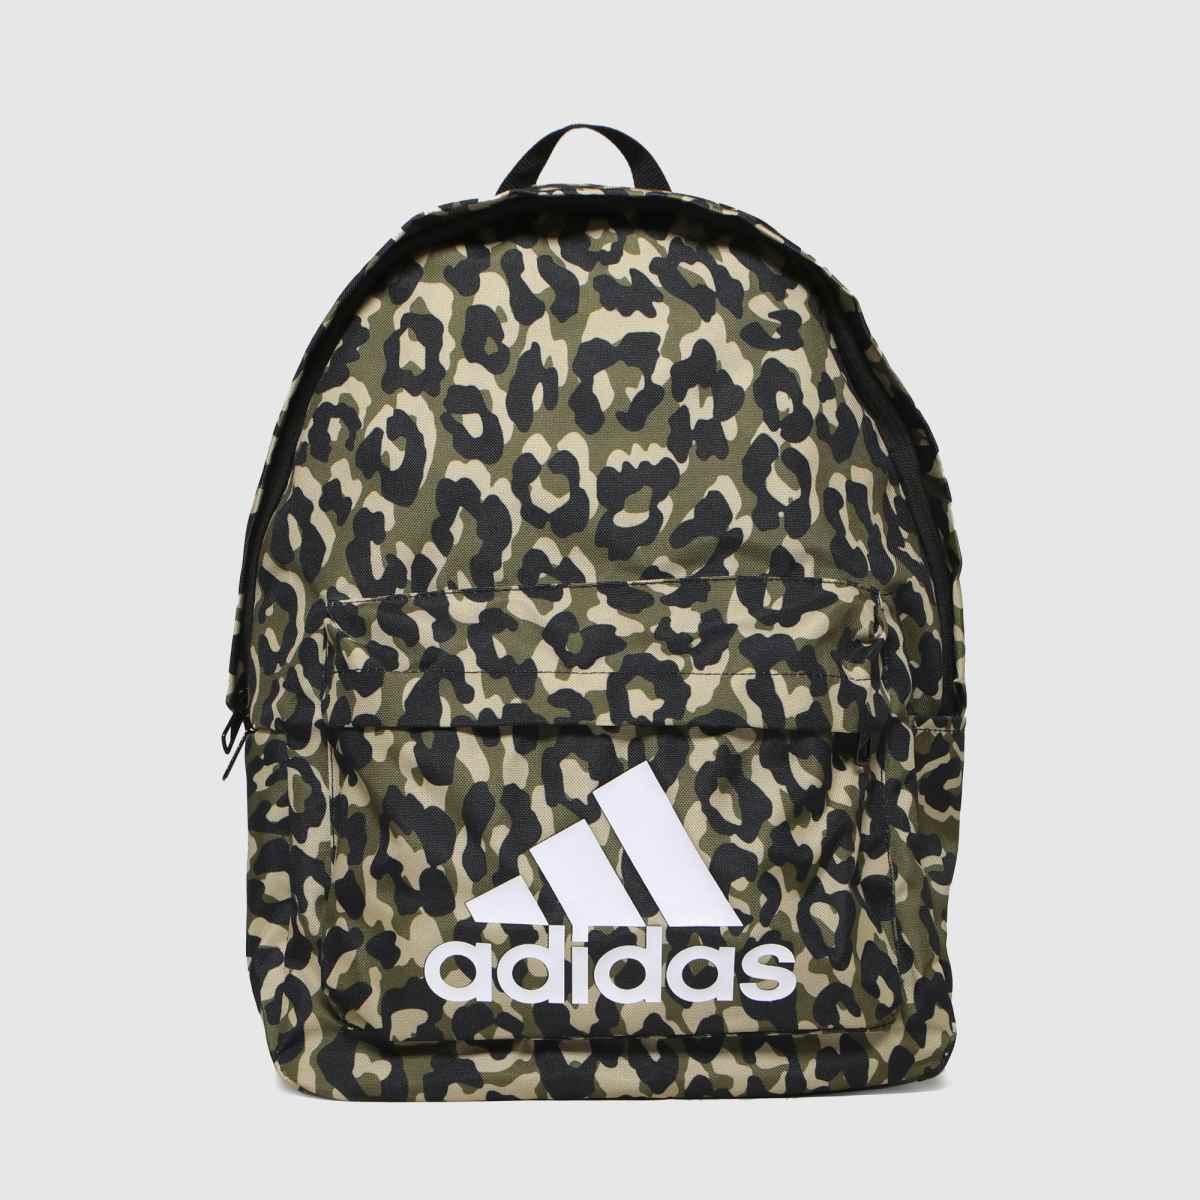 Adidas Black & Brown Bos Bp Leopard